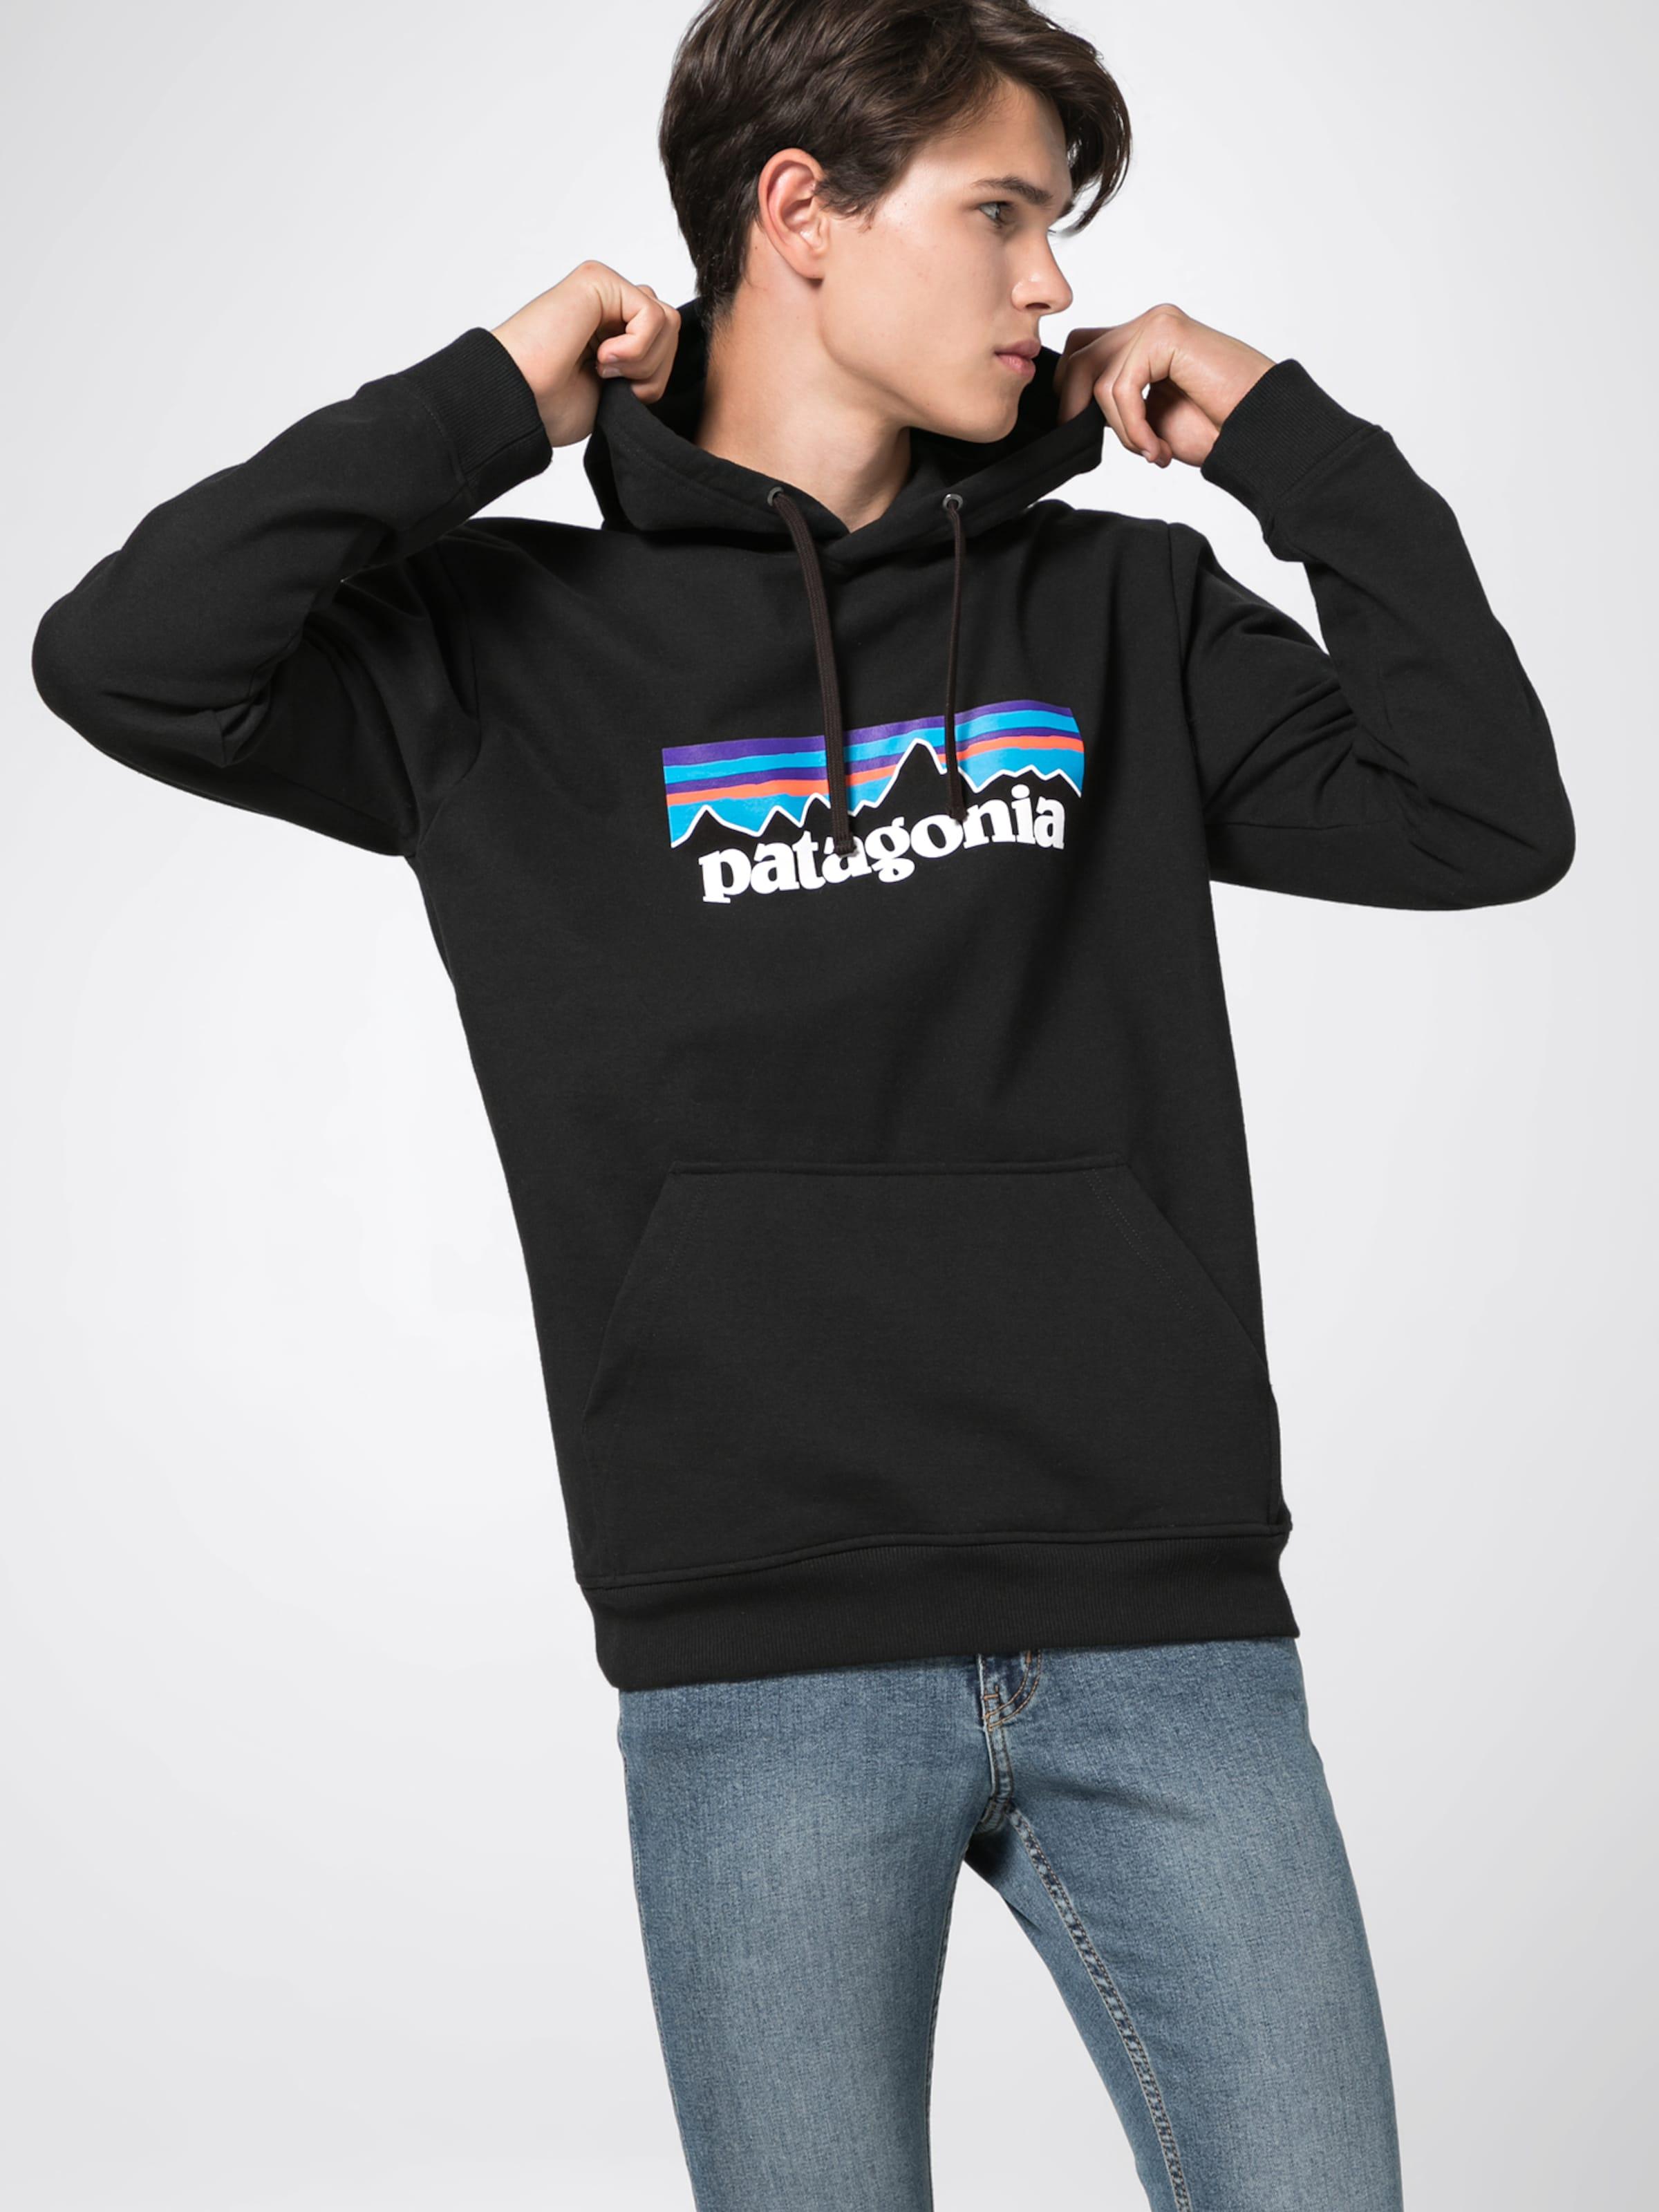 P Weiß 'm's BlauSchwarz Hoodie Uprisal' 6 Patagonia Logo In 8wnvN0Om